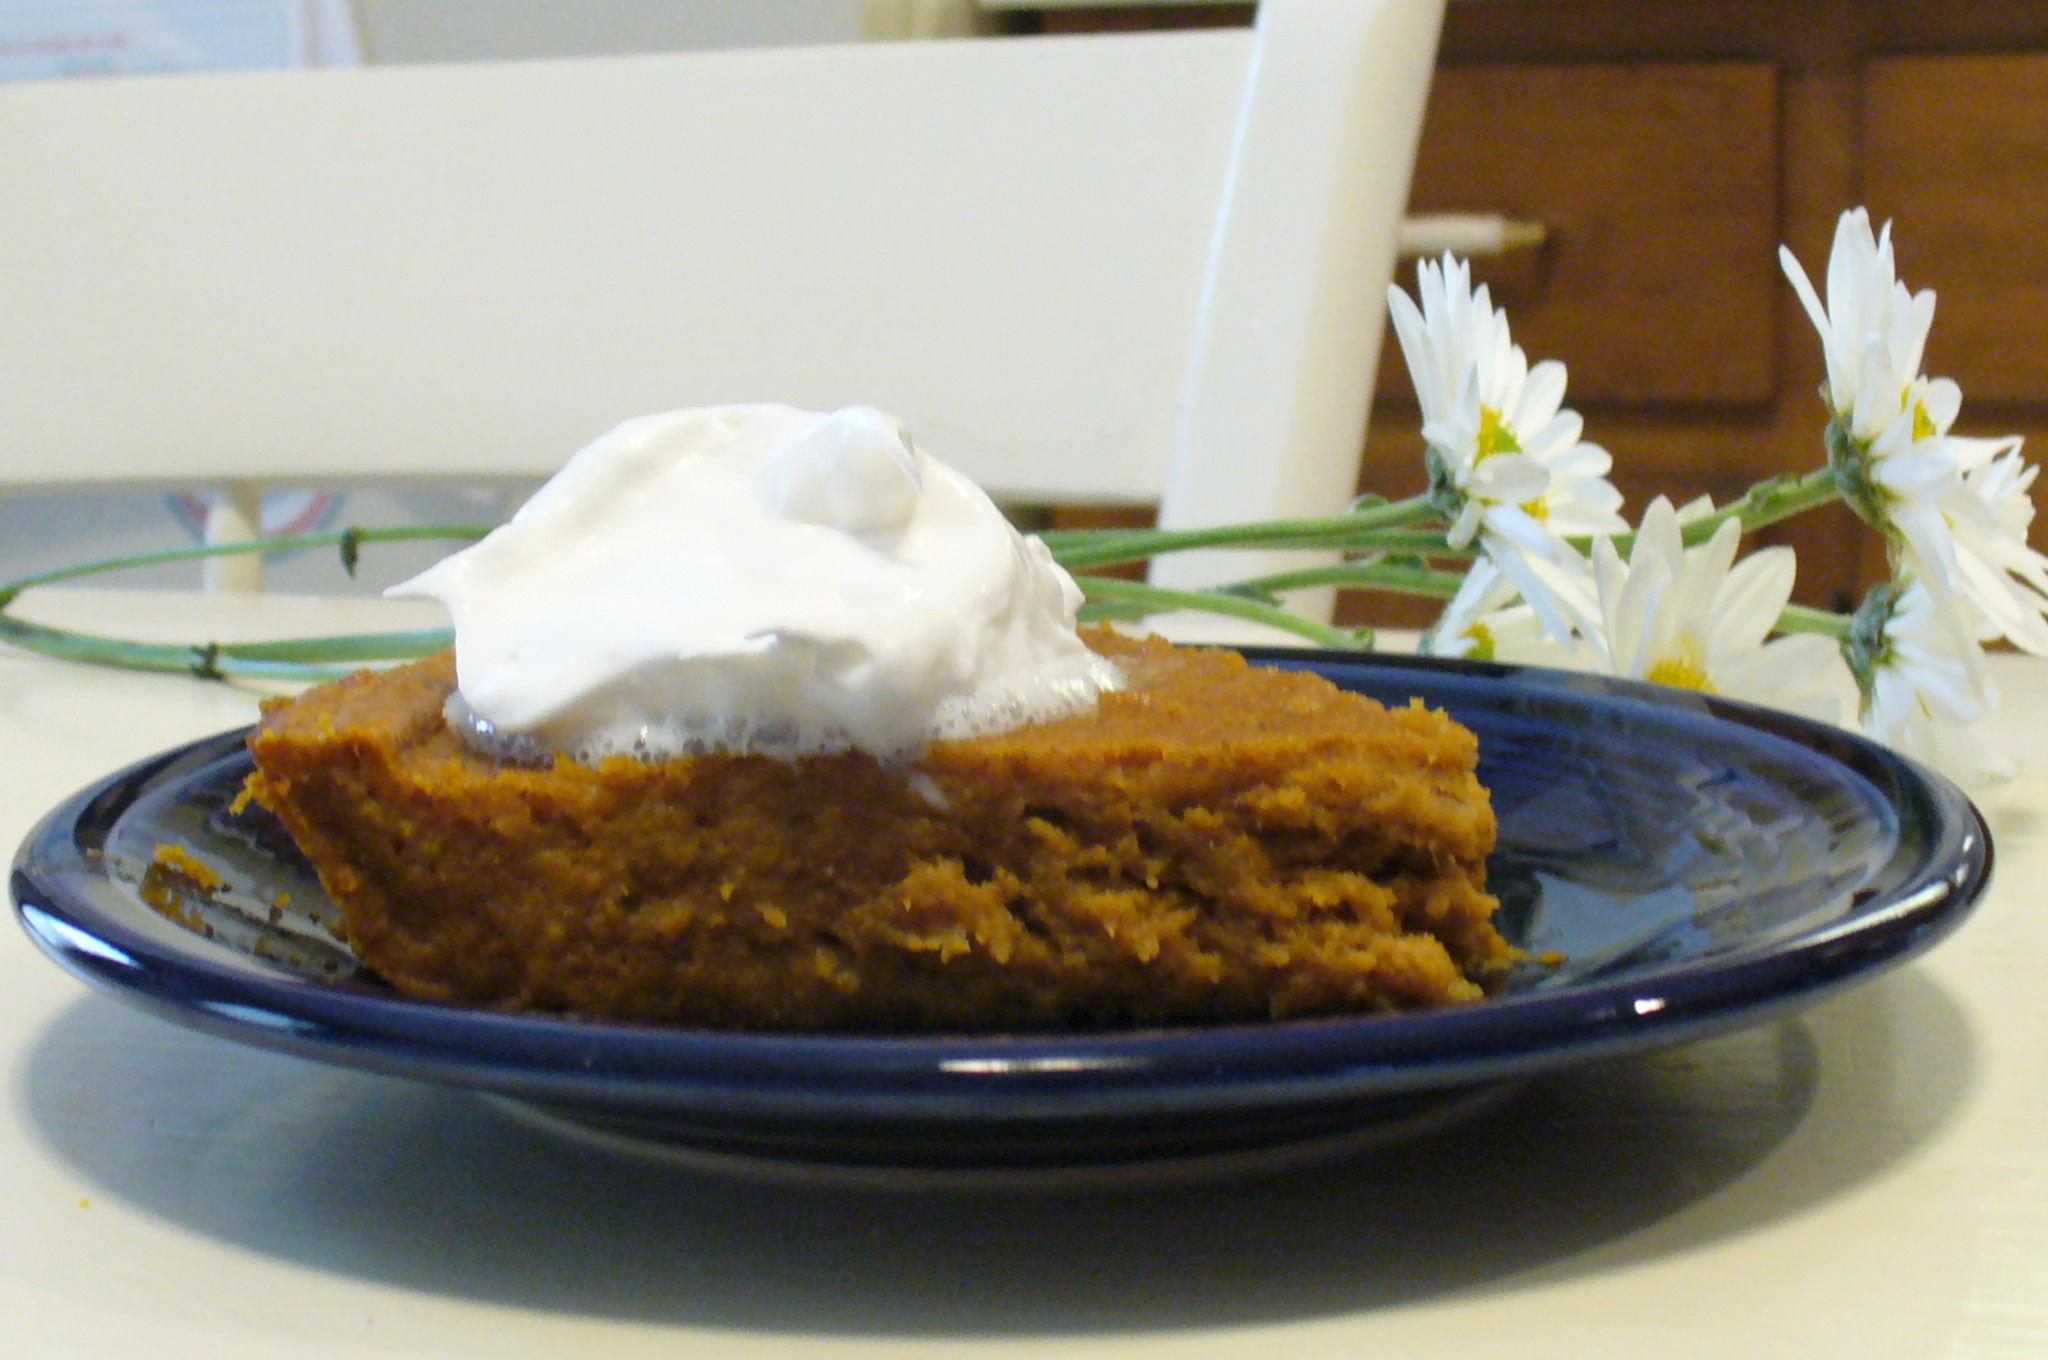 Low Fat Pumpkin Recipes  Low fat pumpkin pie recipe All recipes UK